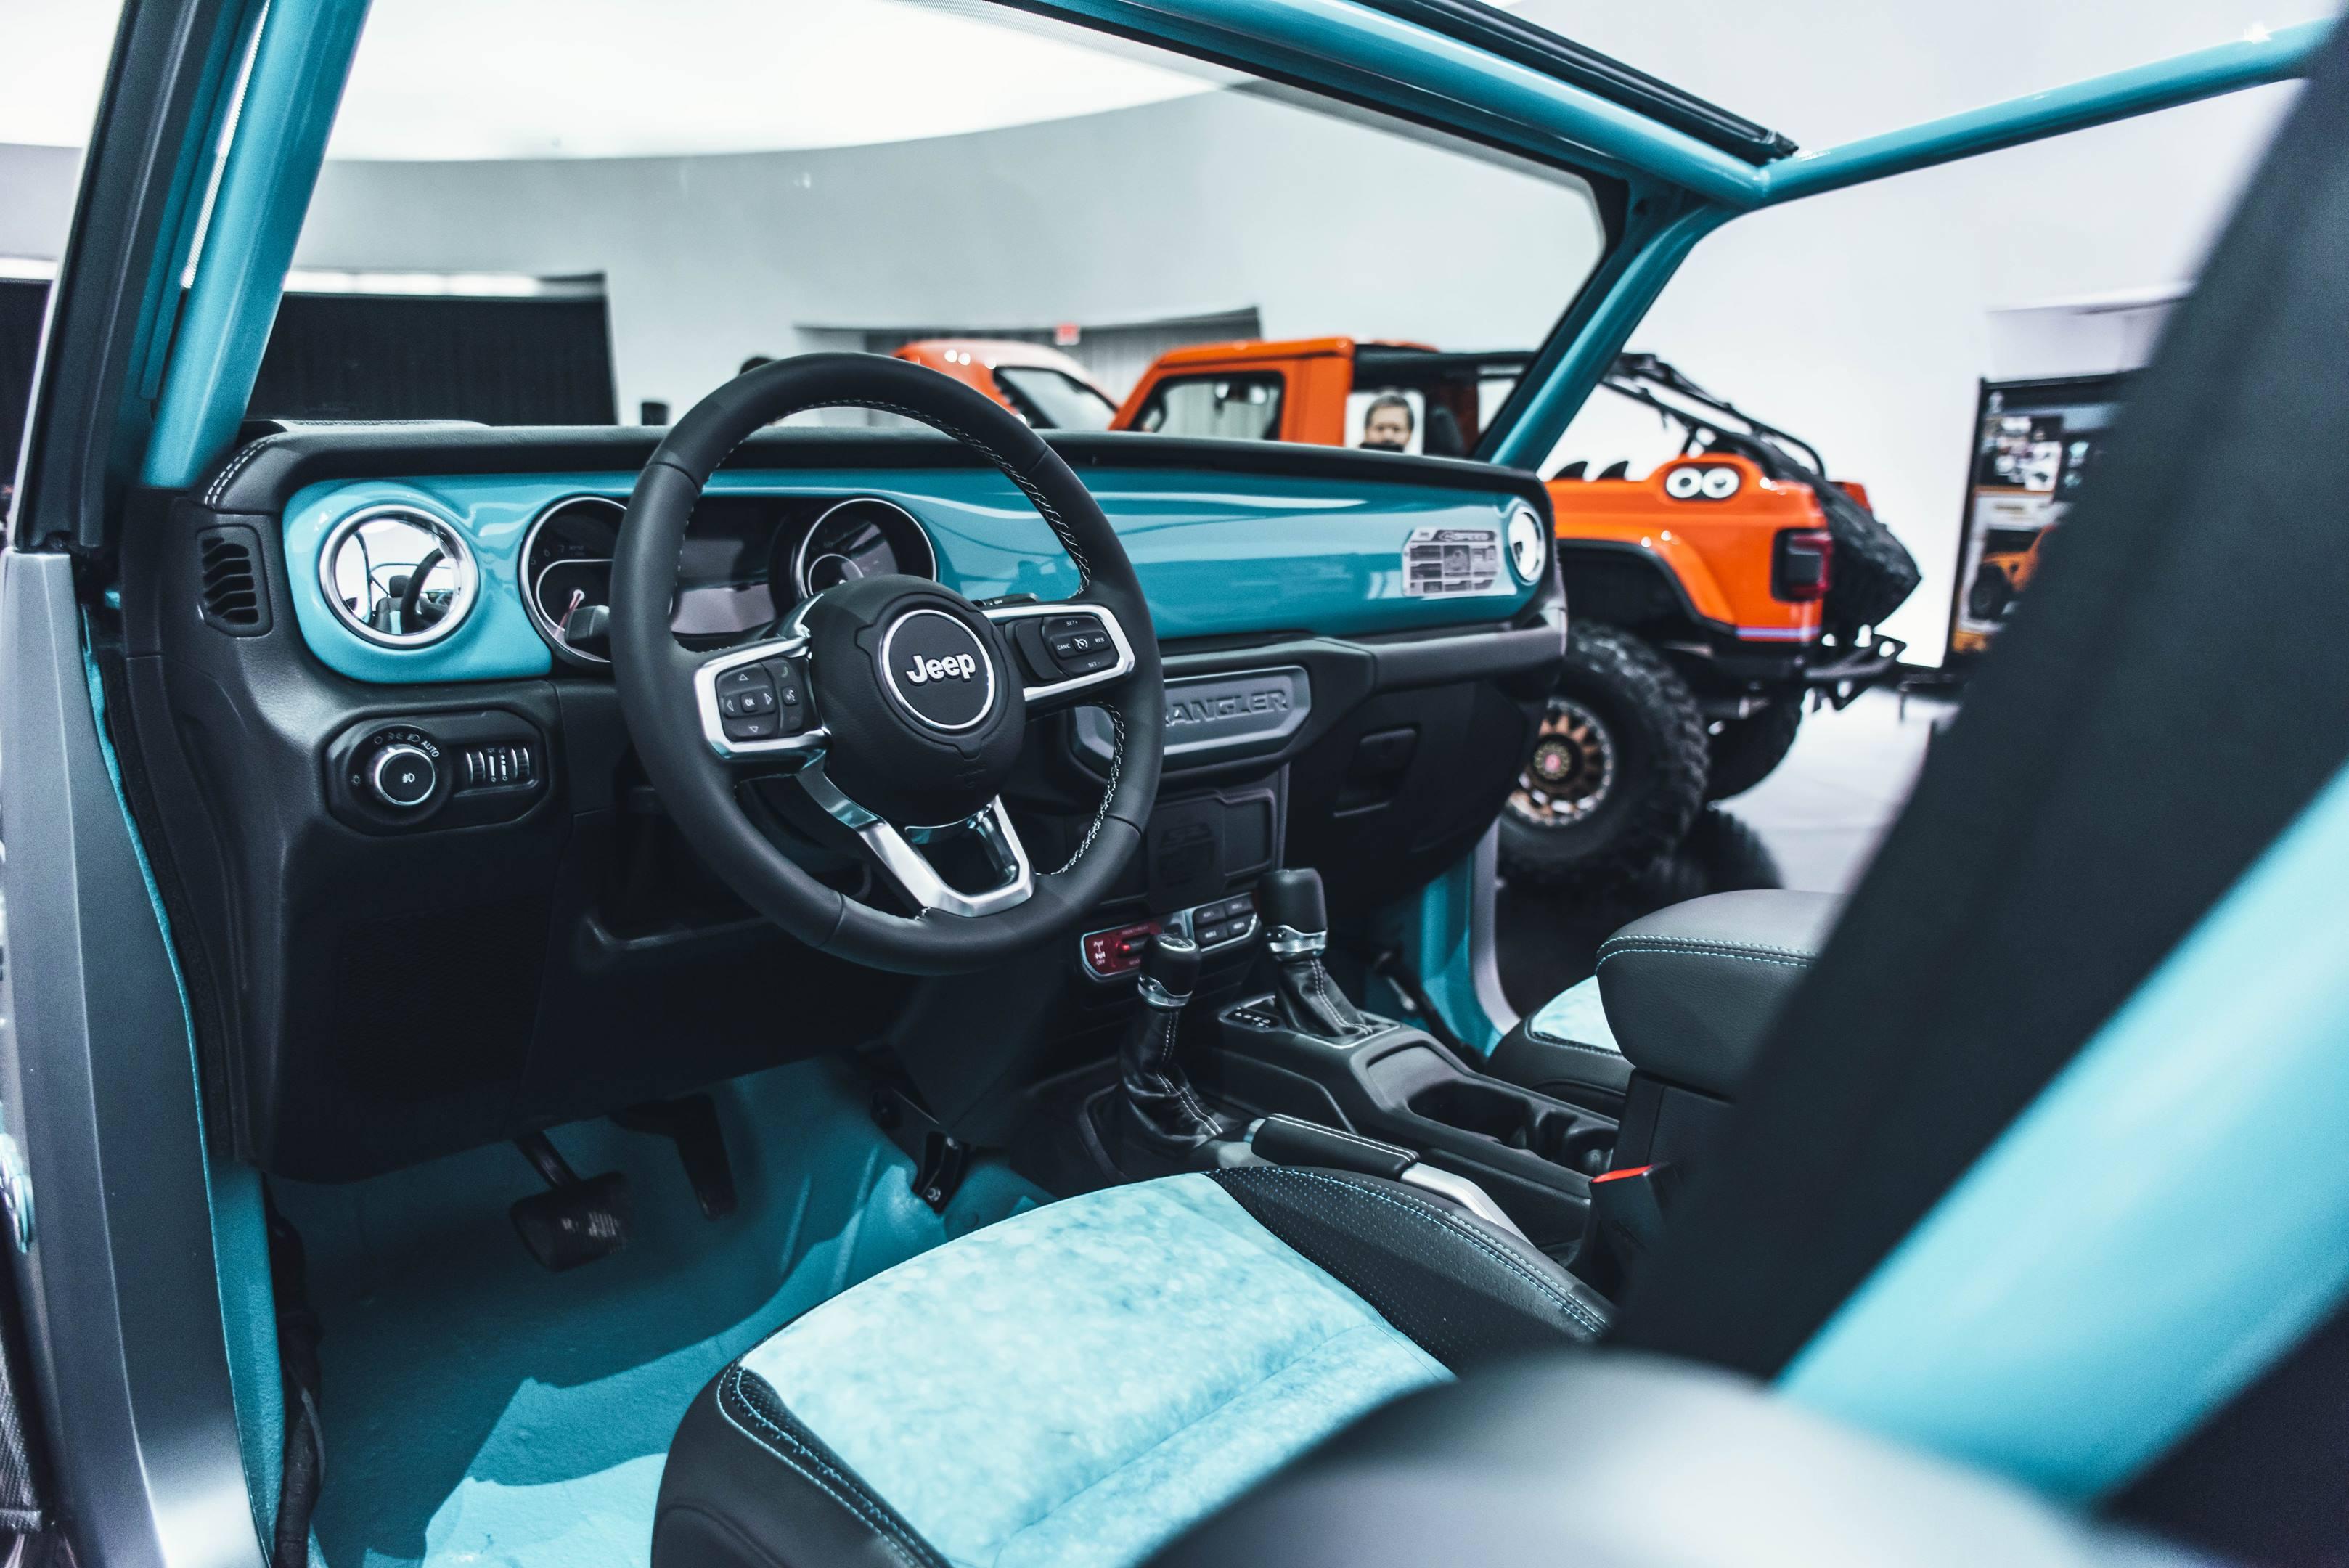 2018 Jeep 4Speed Concept interior